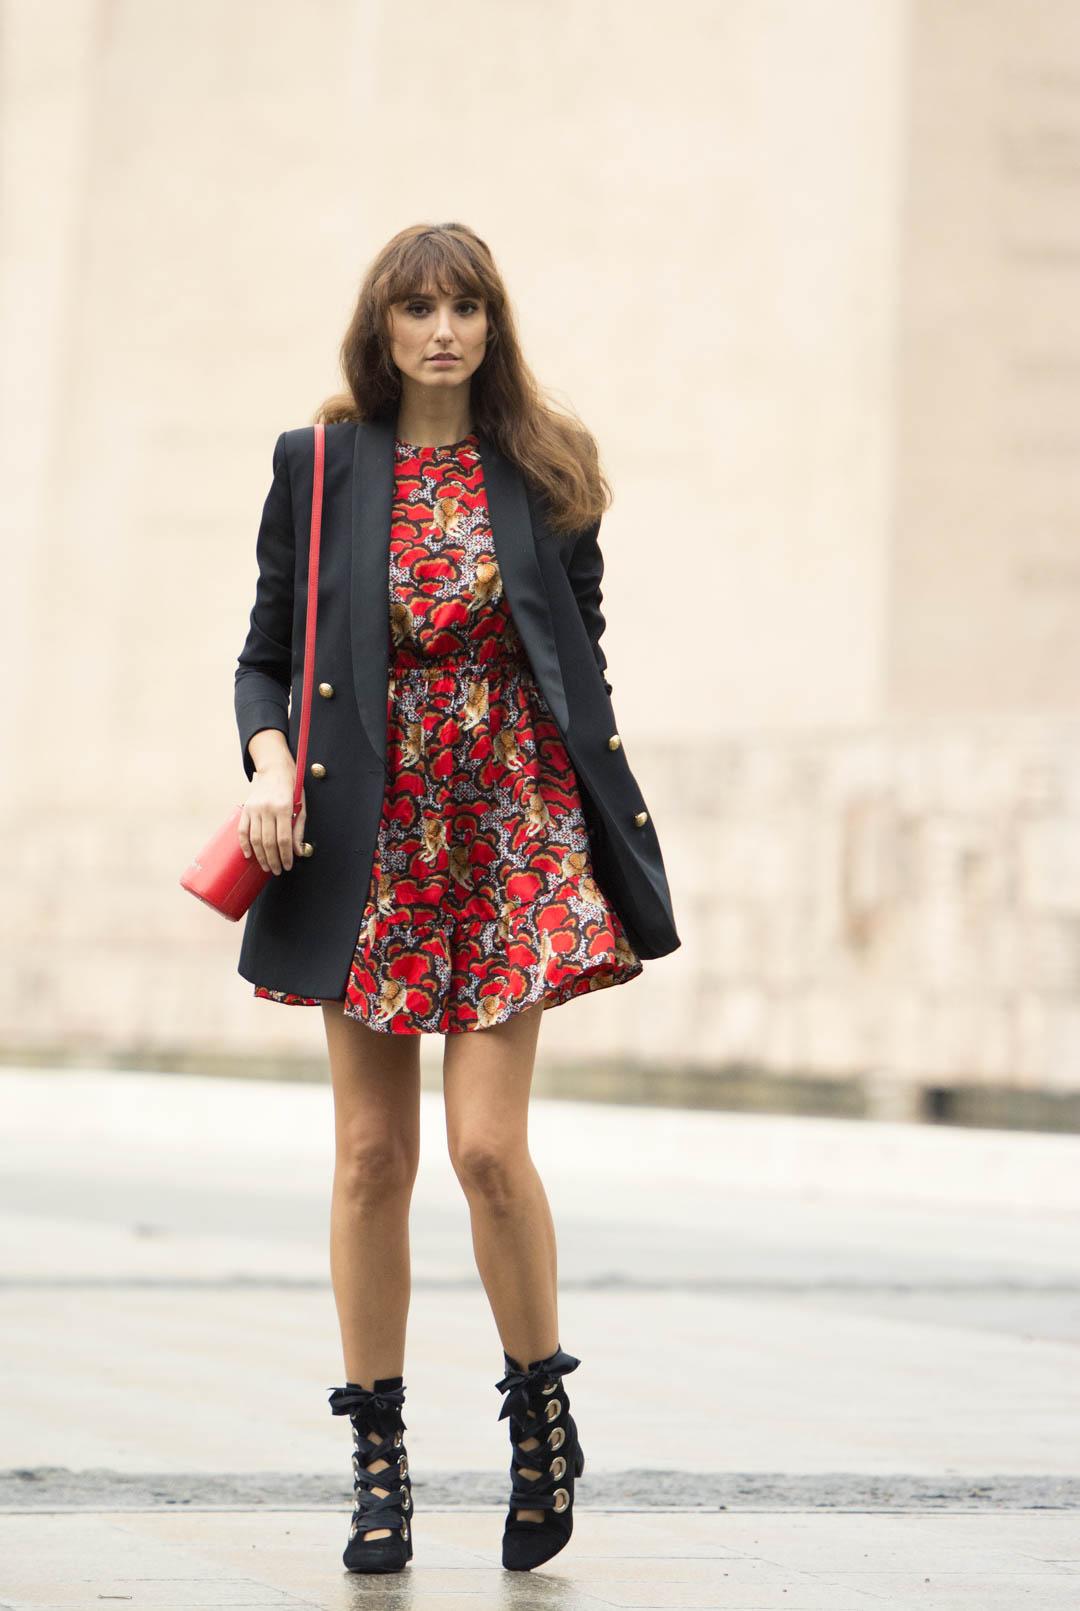 sandro-red-dress-mitmeblog-street-style-mayte-de-la-iglesia-web-05